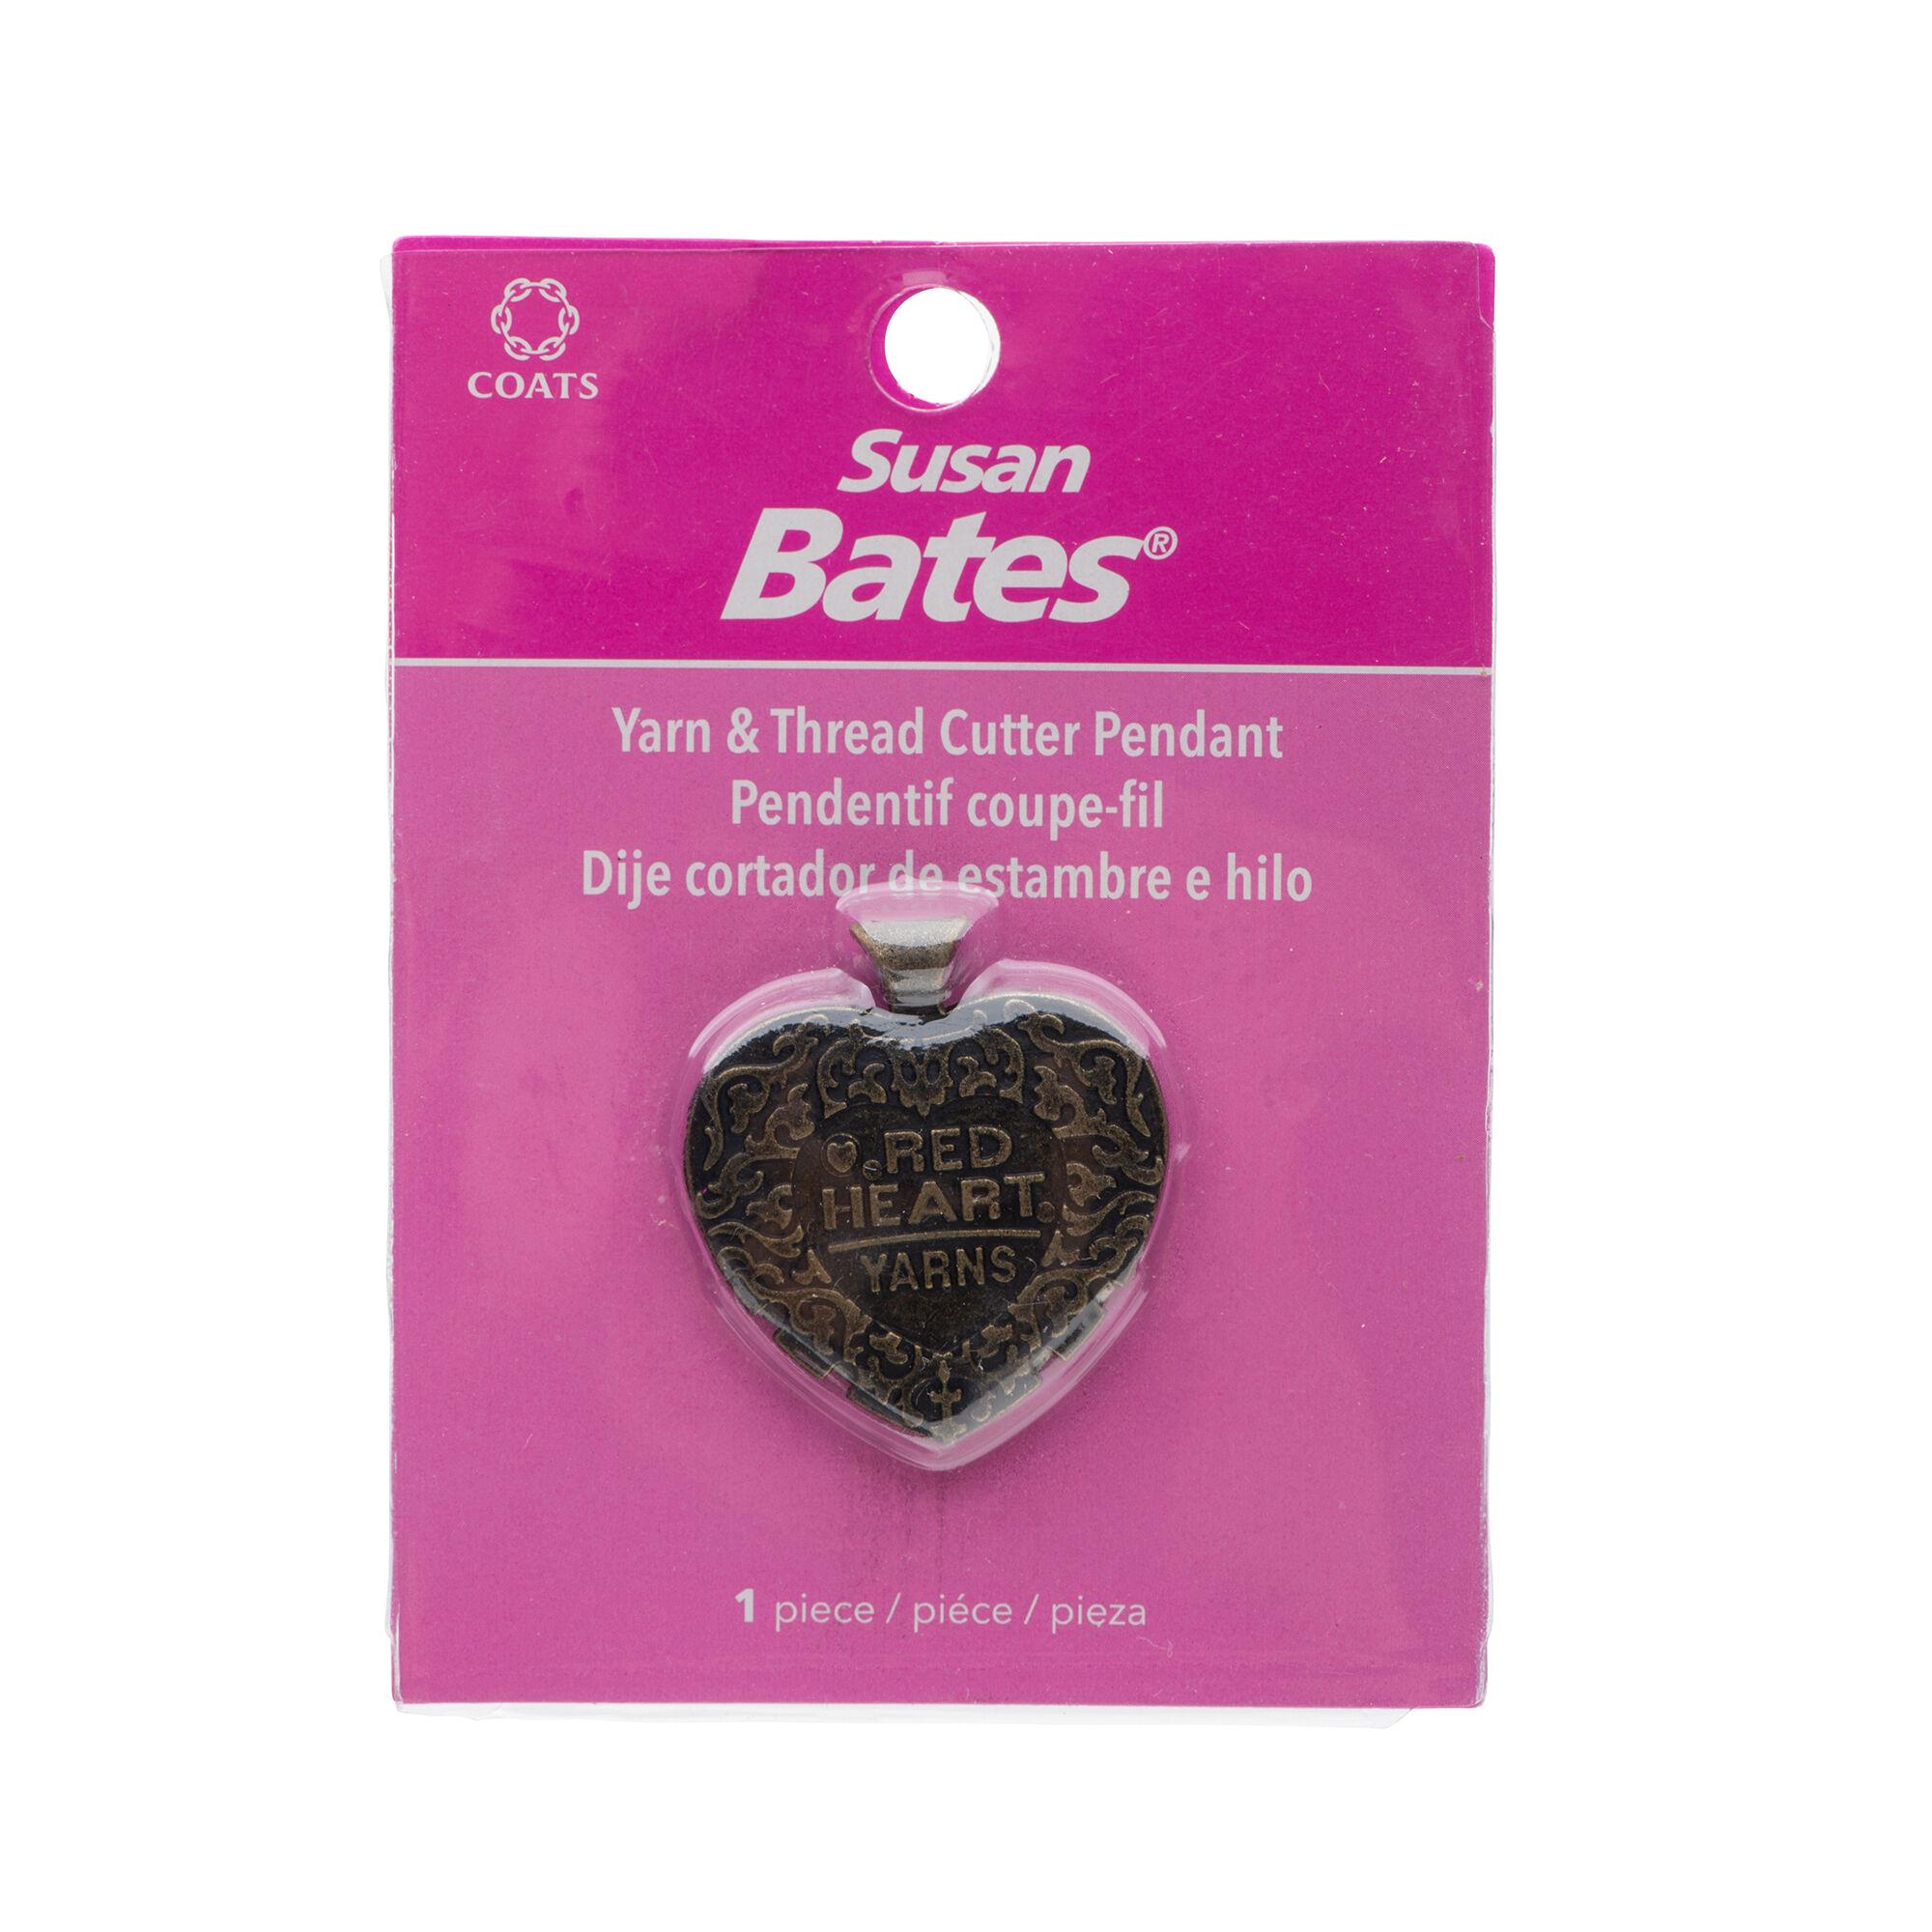 Susan Bates Yarn and Thread Cutter Pendant